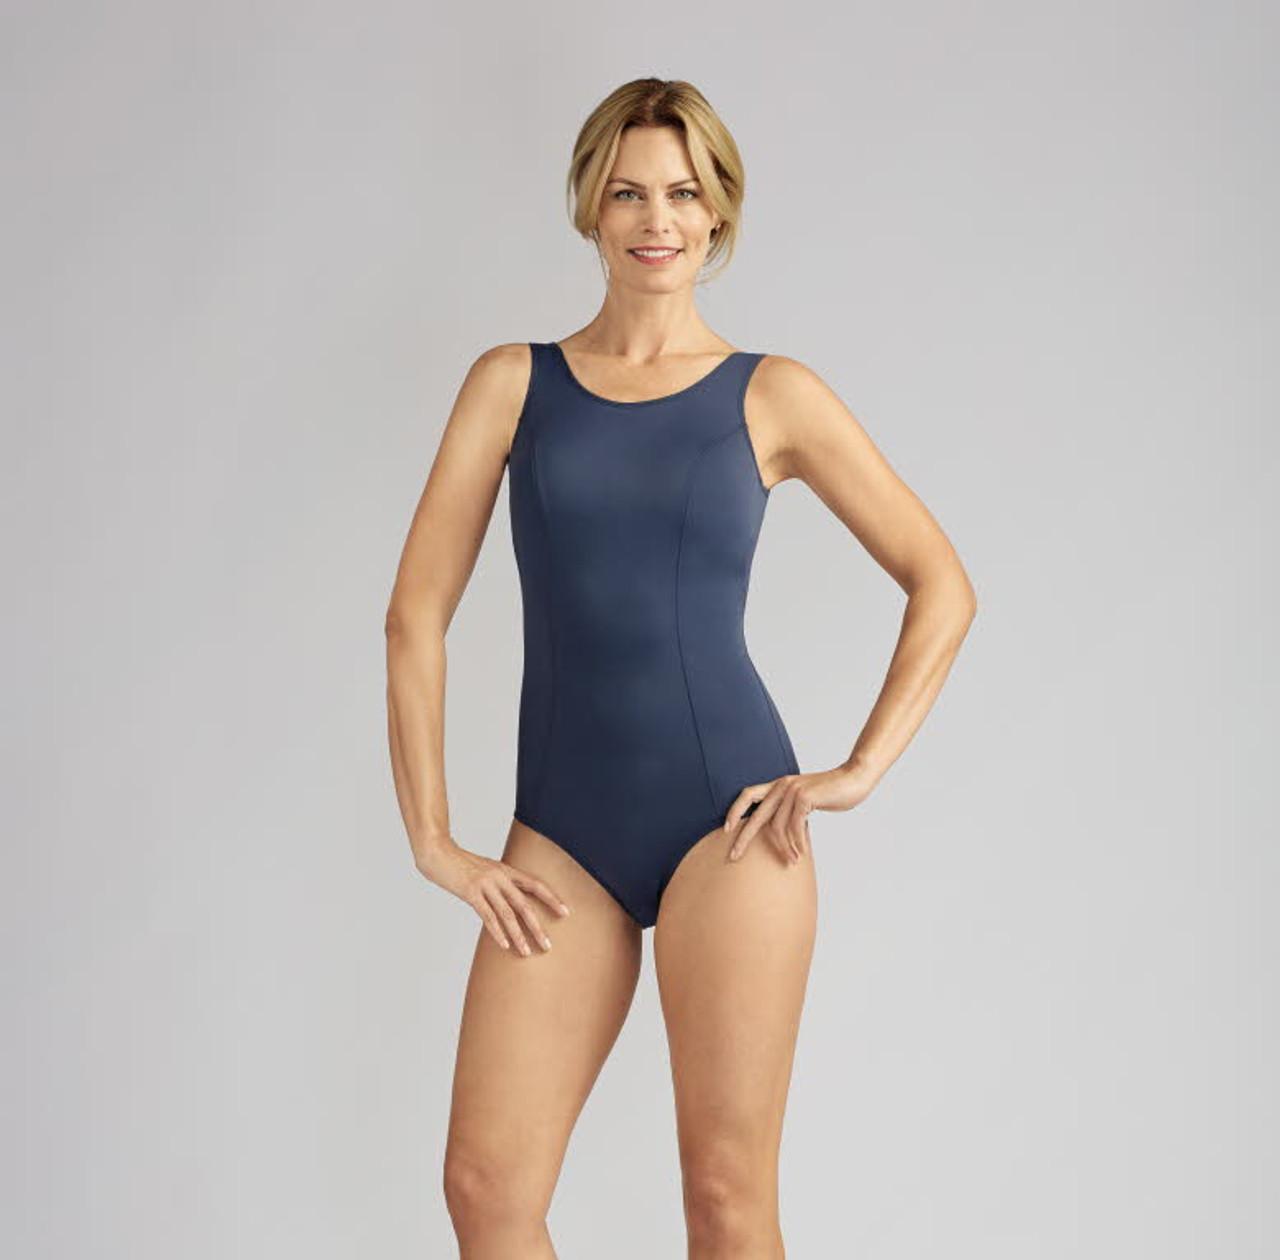 36b69b180c4 Amoena 70842/70654 Rhodes One-Piece Mastectomy Swimsuit ...